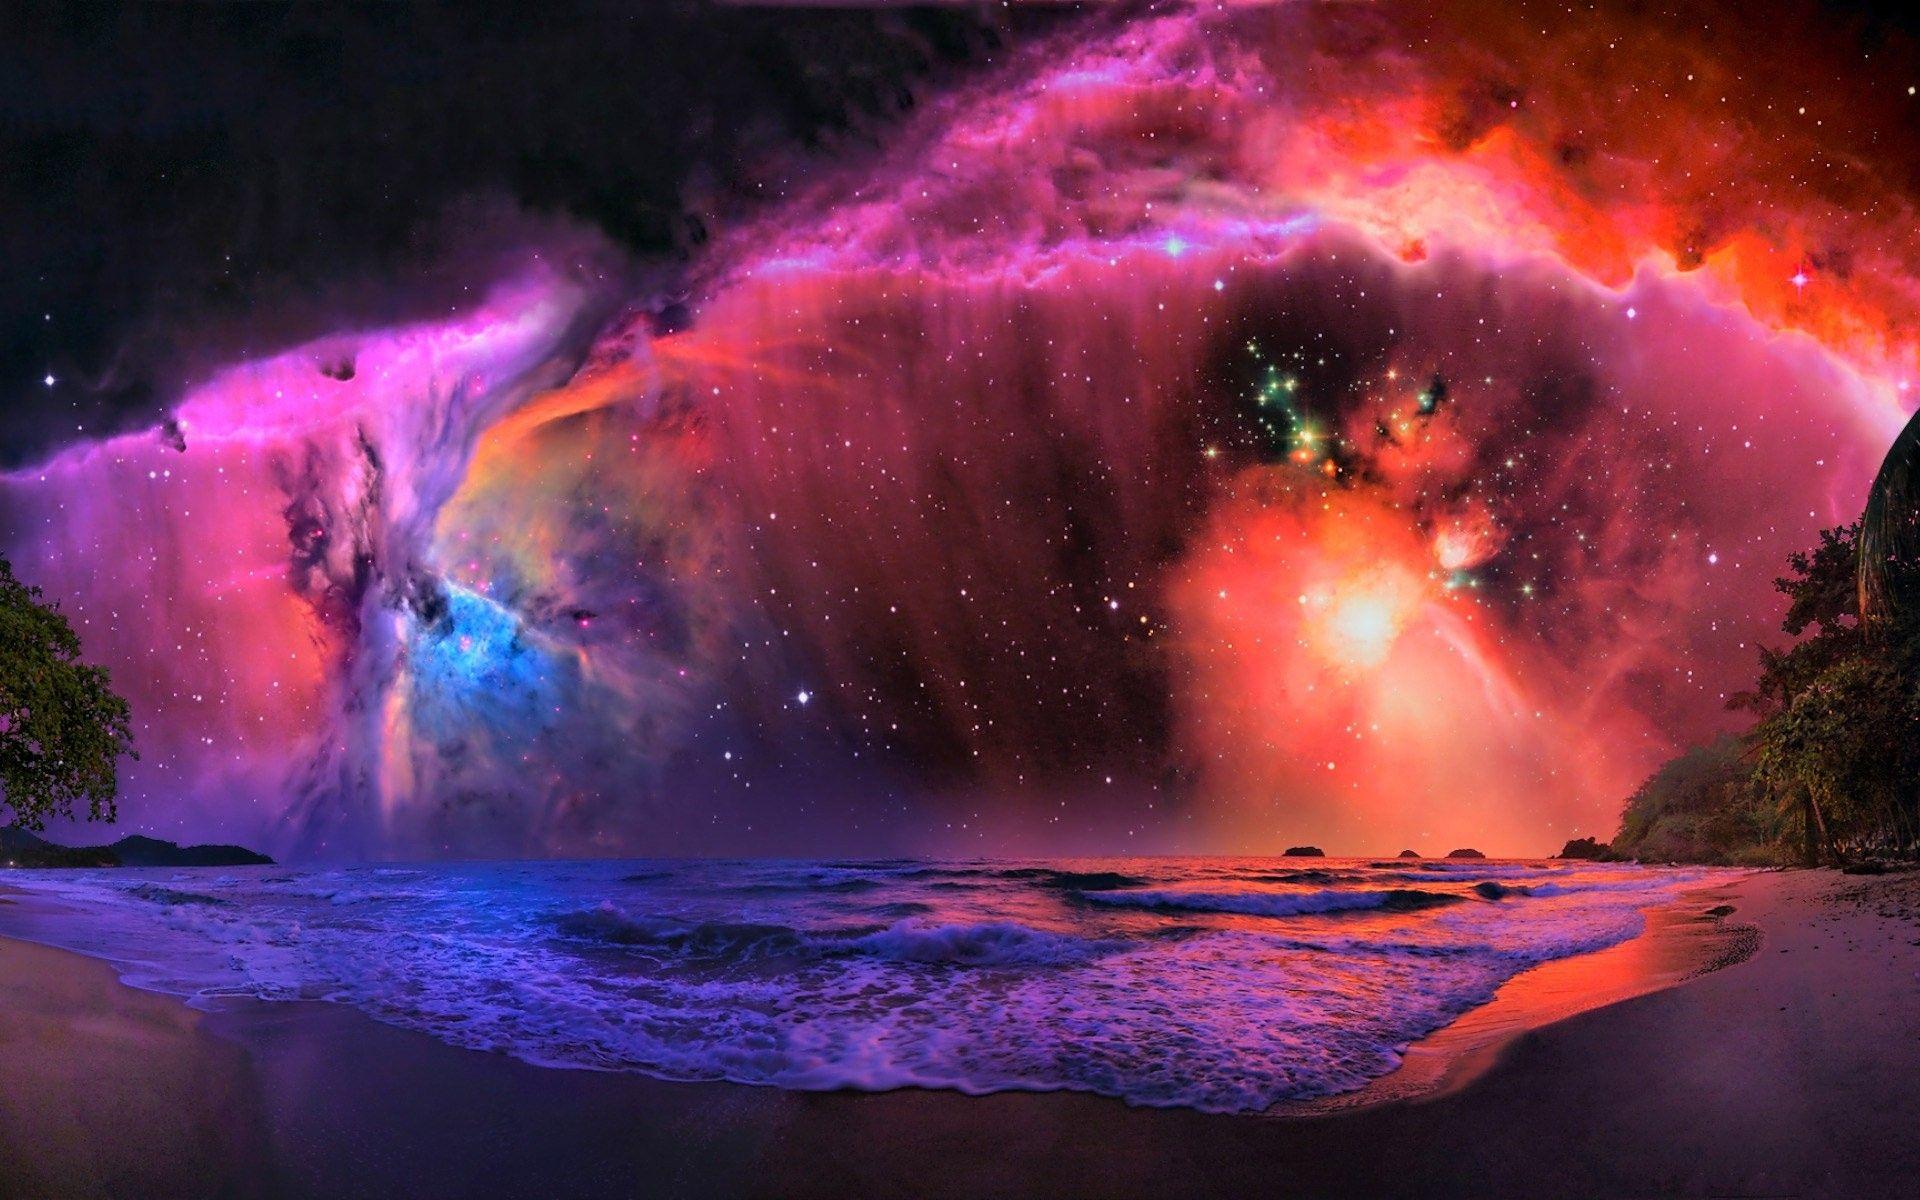 Google theme universe - Beautiful Galaxy Backgrounds Tumblr Google Search